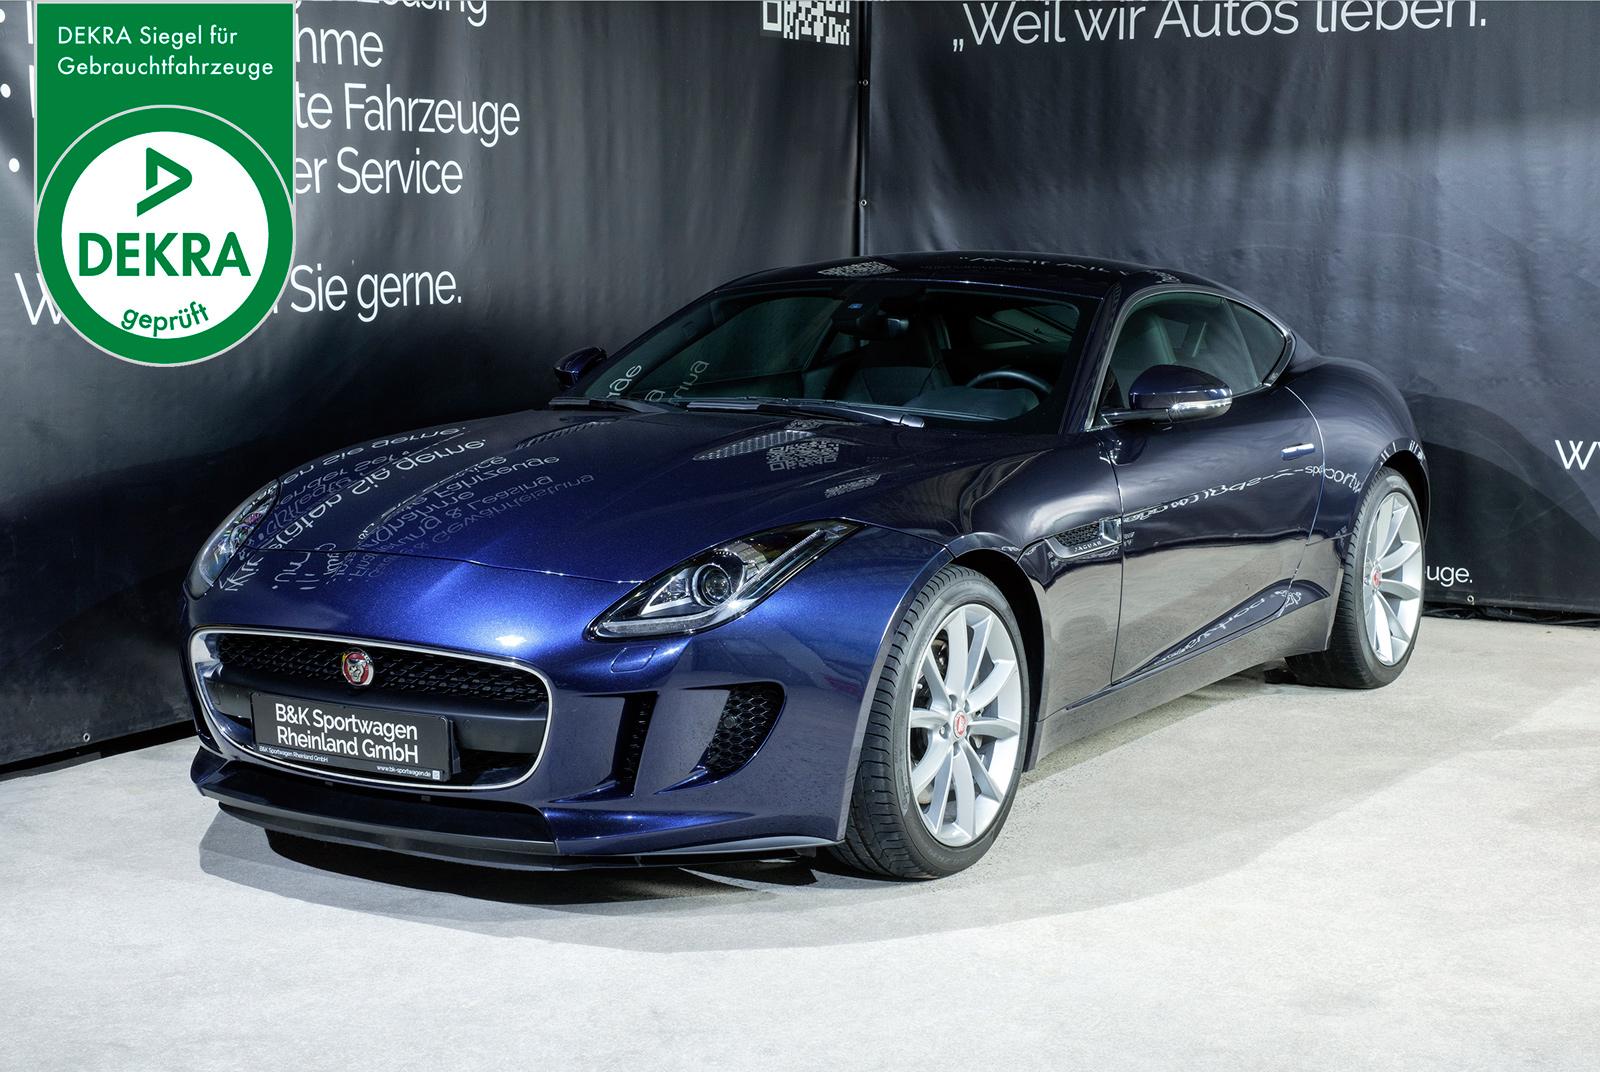 Jaguar_f-type_dark_sapphire_dekra_bk_sportwagen